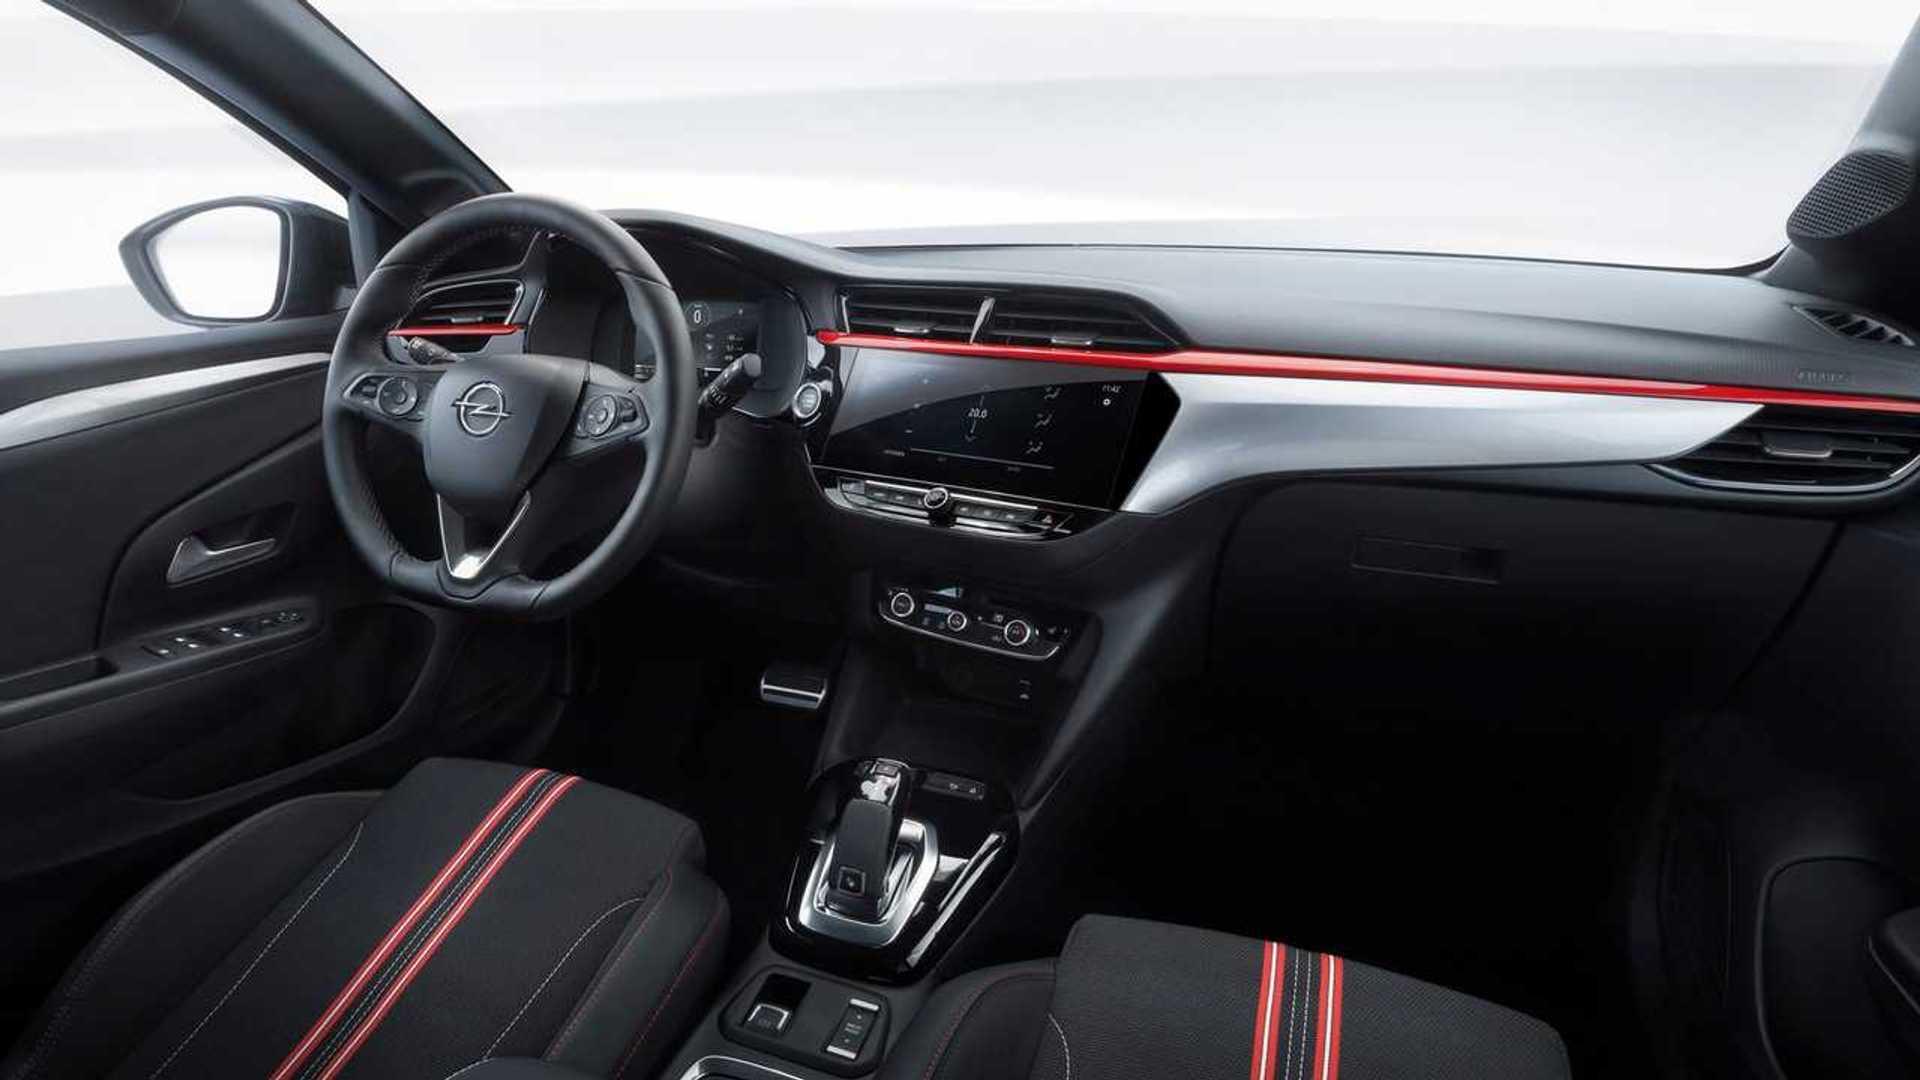 2021 Opel Corsa Prices